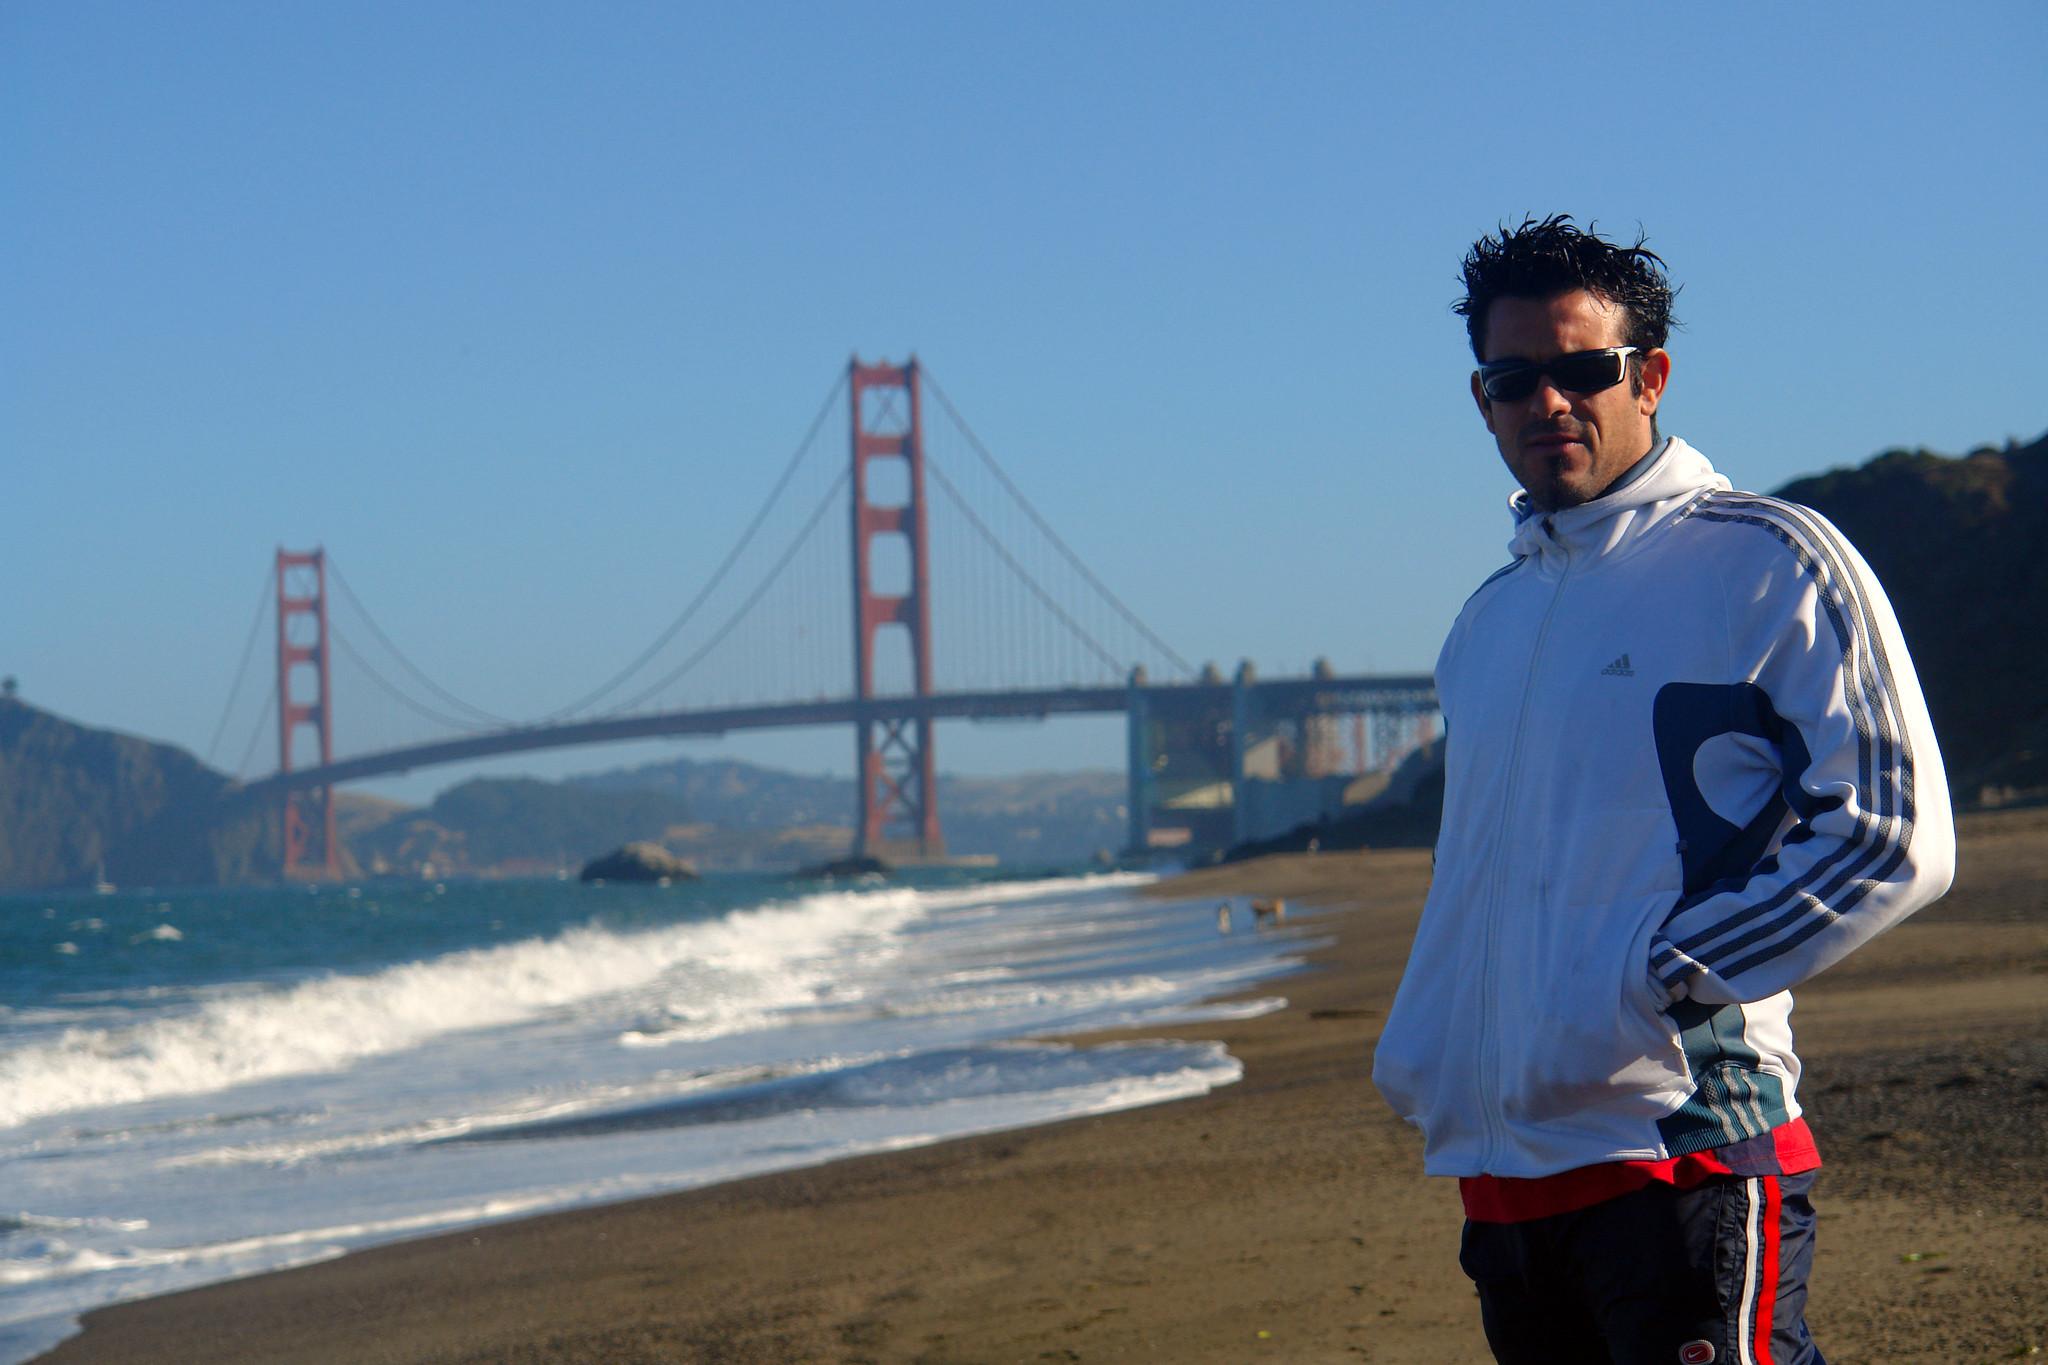 Que ver en San Francisco, California que ver en san francisco - 26012536917 1e69ff92b1 k - 10 lugares mágicos que ver en San Francisco, California